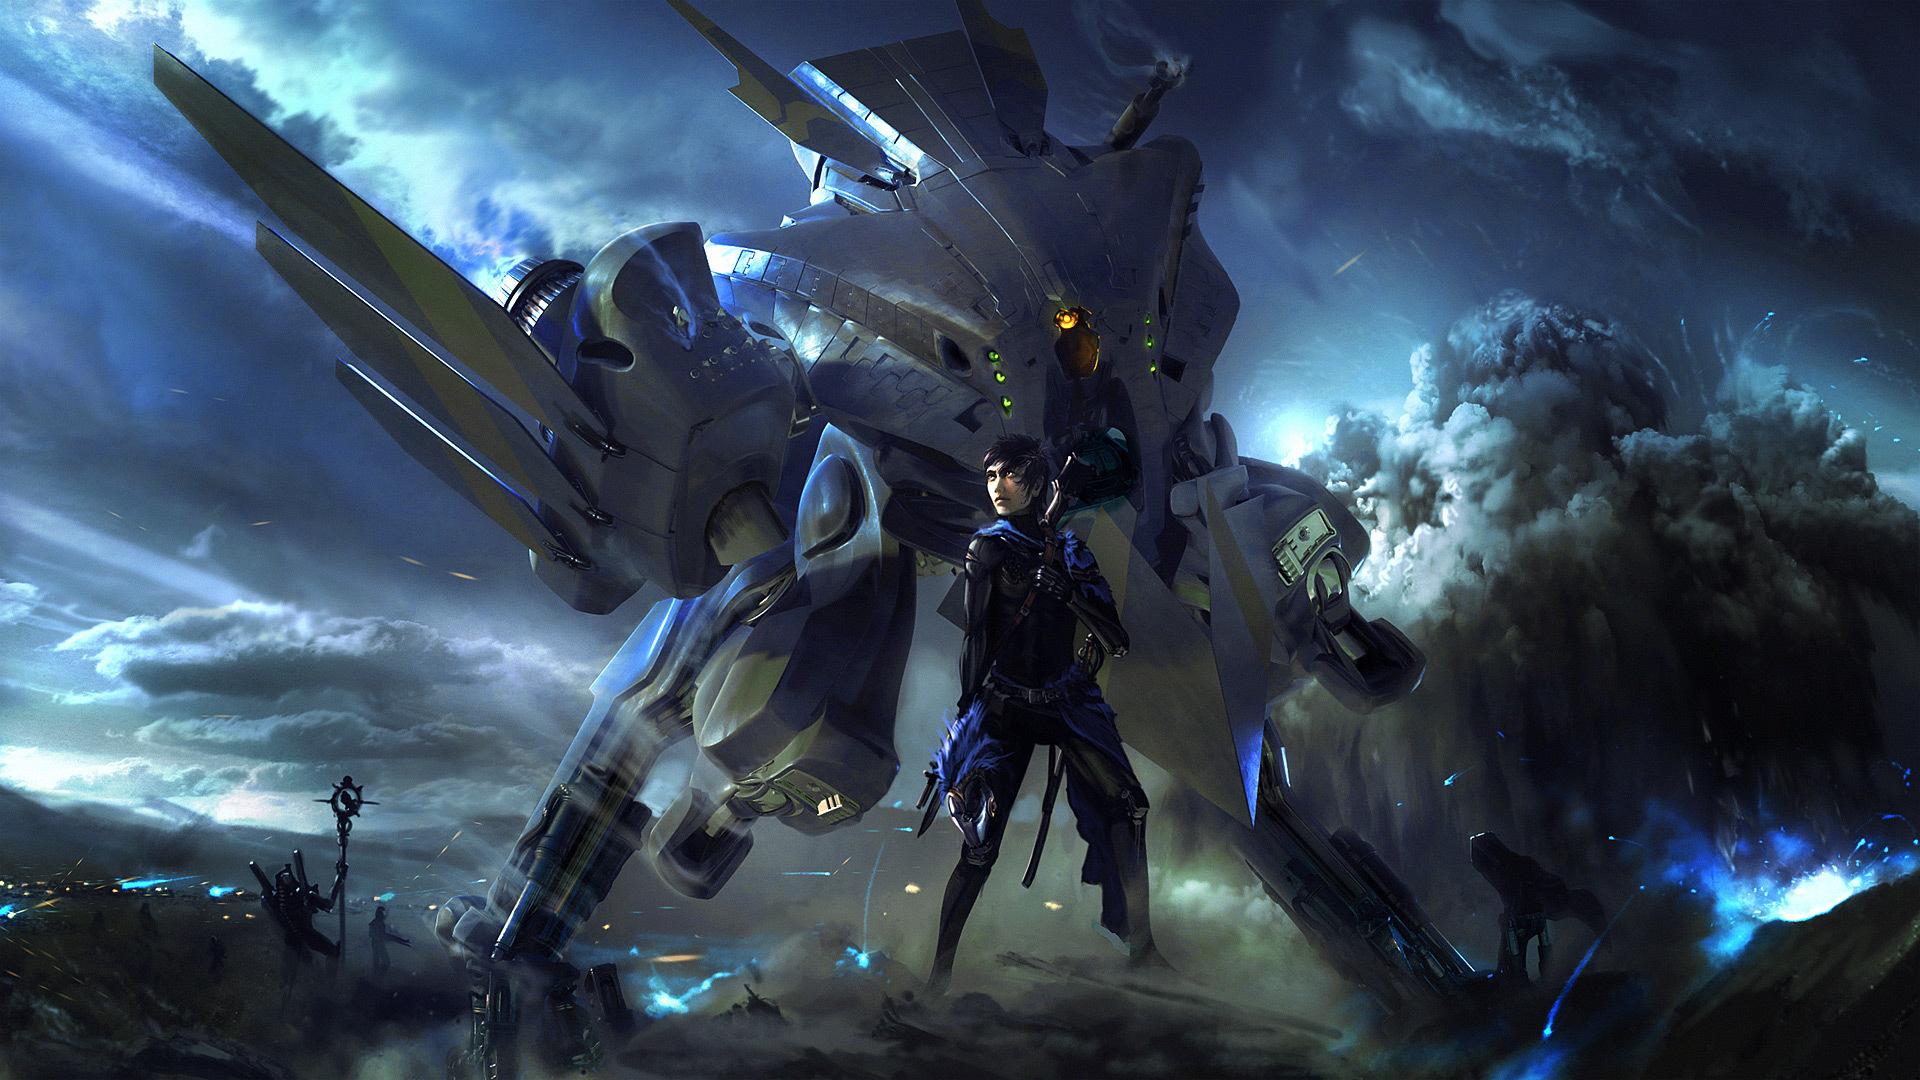 sci fi art - HD1920×1080